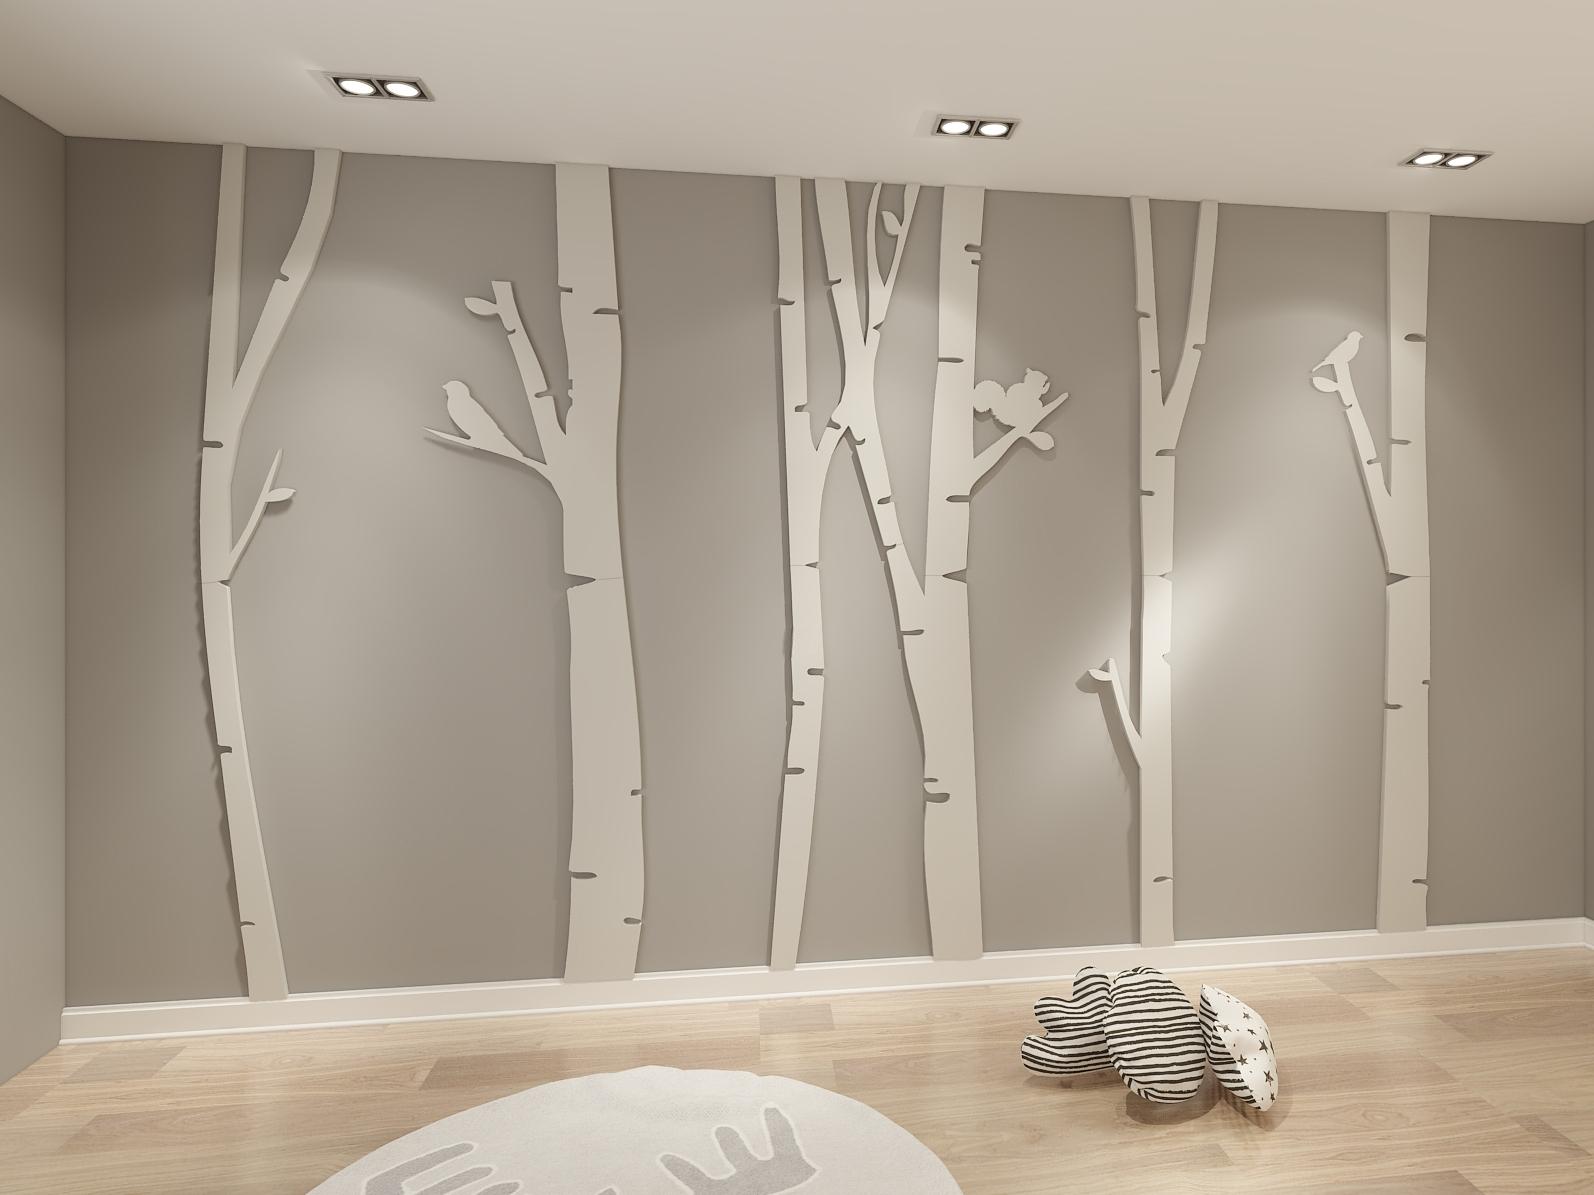 Birch Tree Wall Art Regarding Current Birch Tree 3D Wall Art – Moonwallstickers (View 6 of 15)